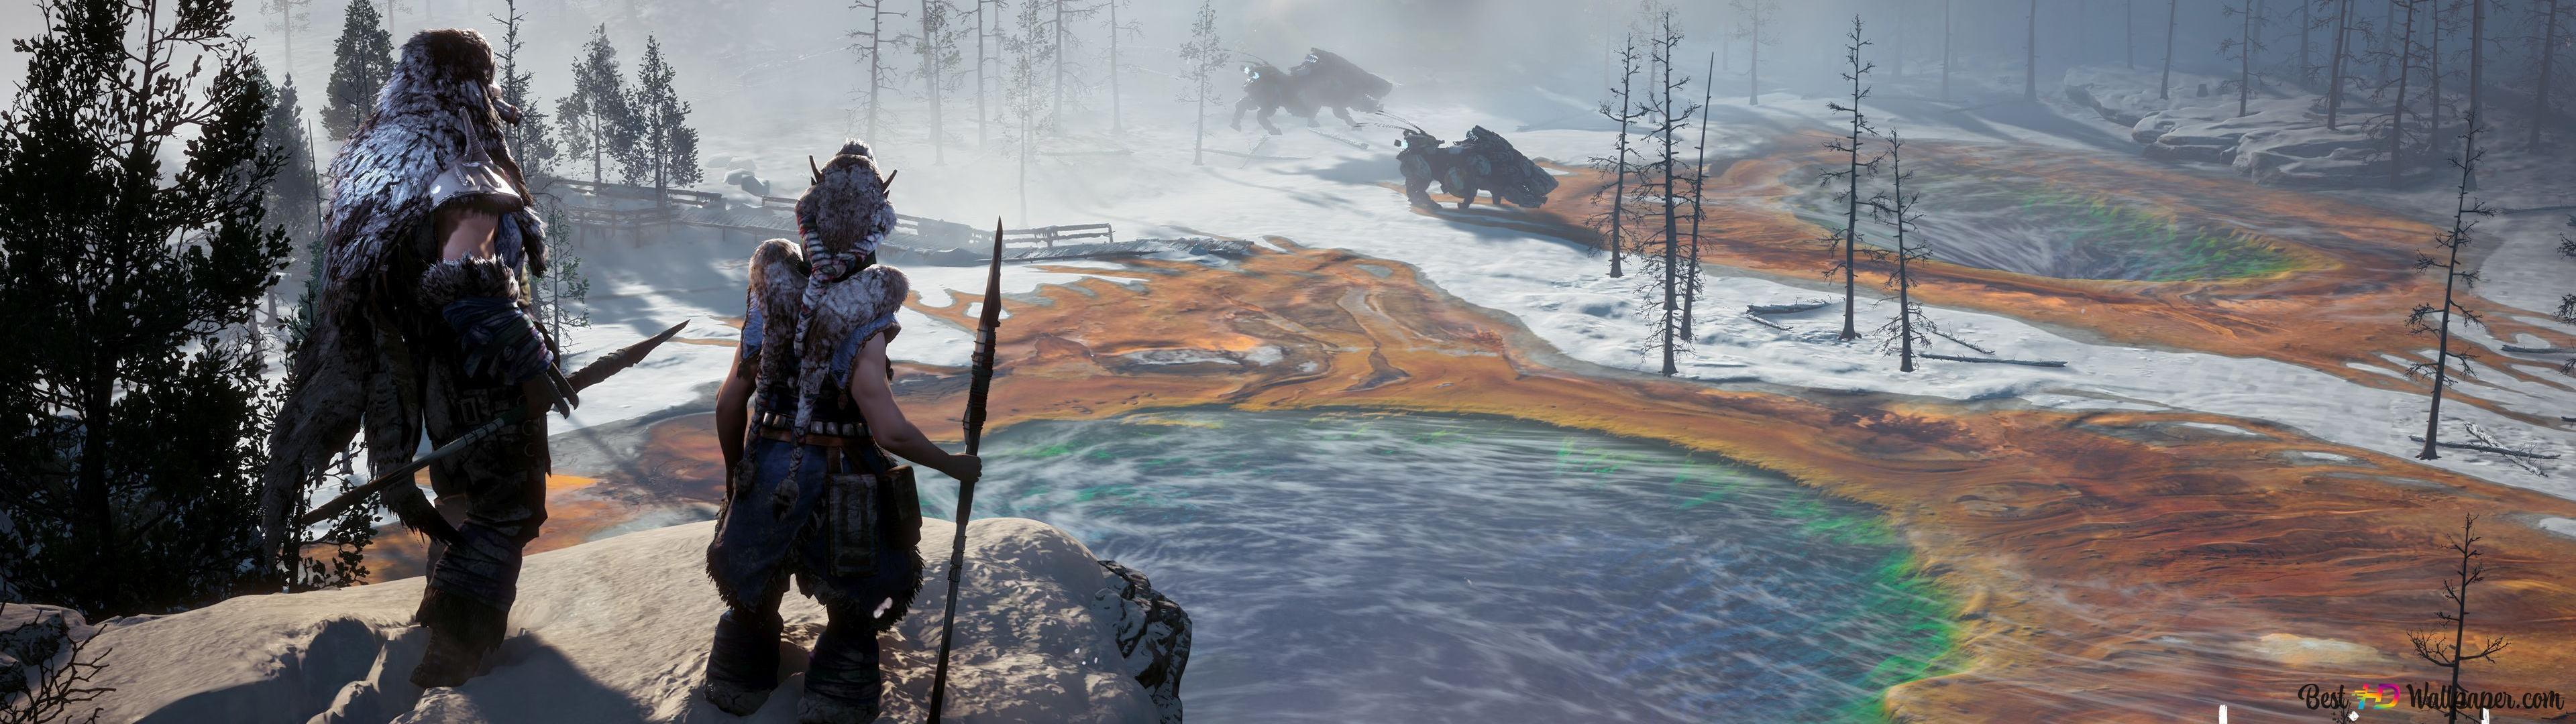 Horizon Zero Dawn Frozen Wilds Hd Wallpaper Download